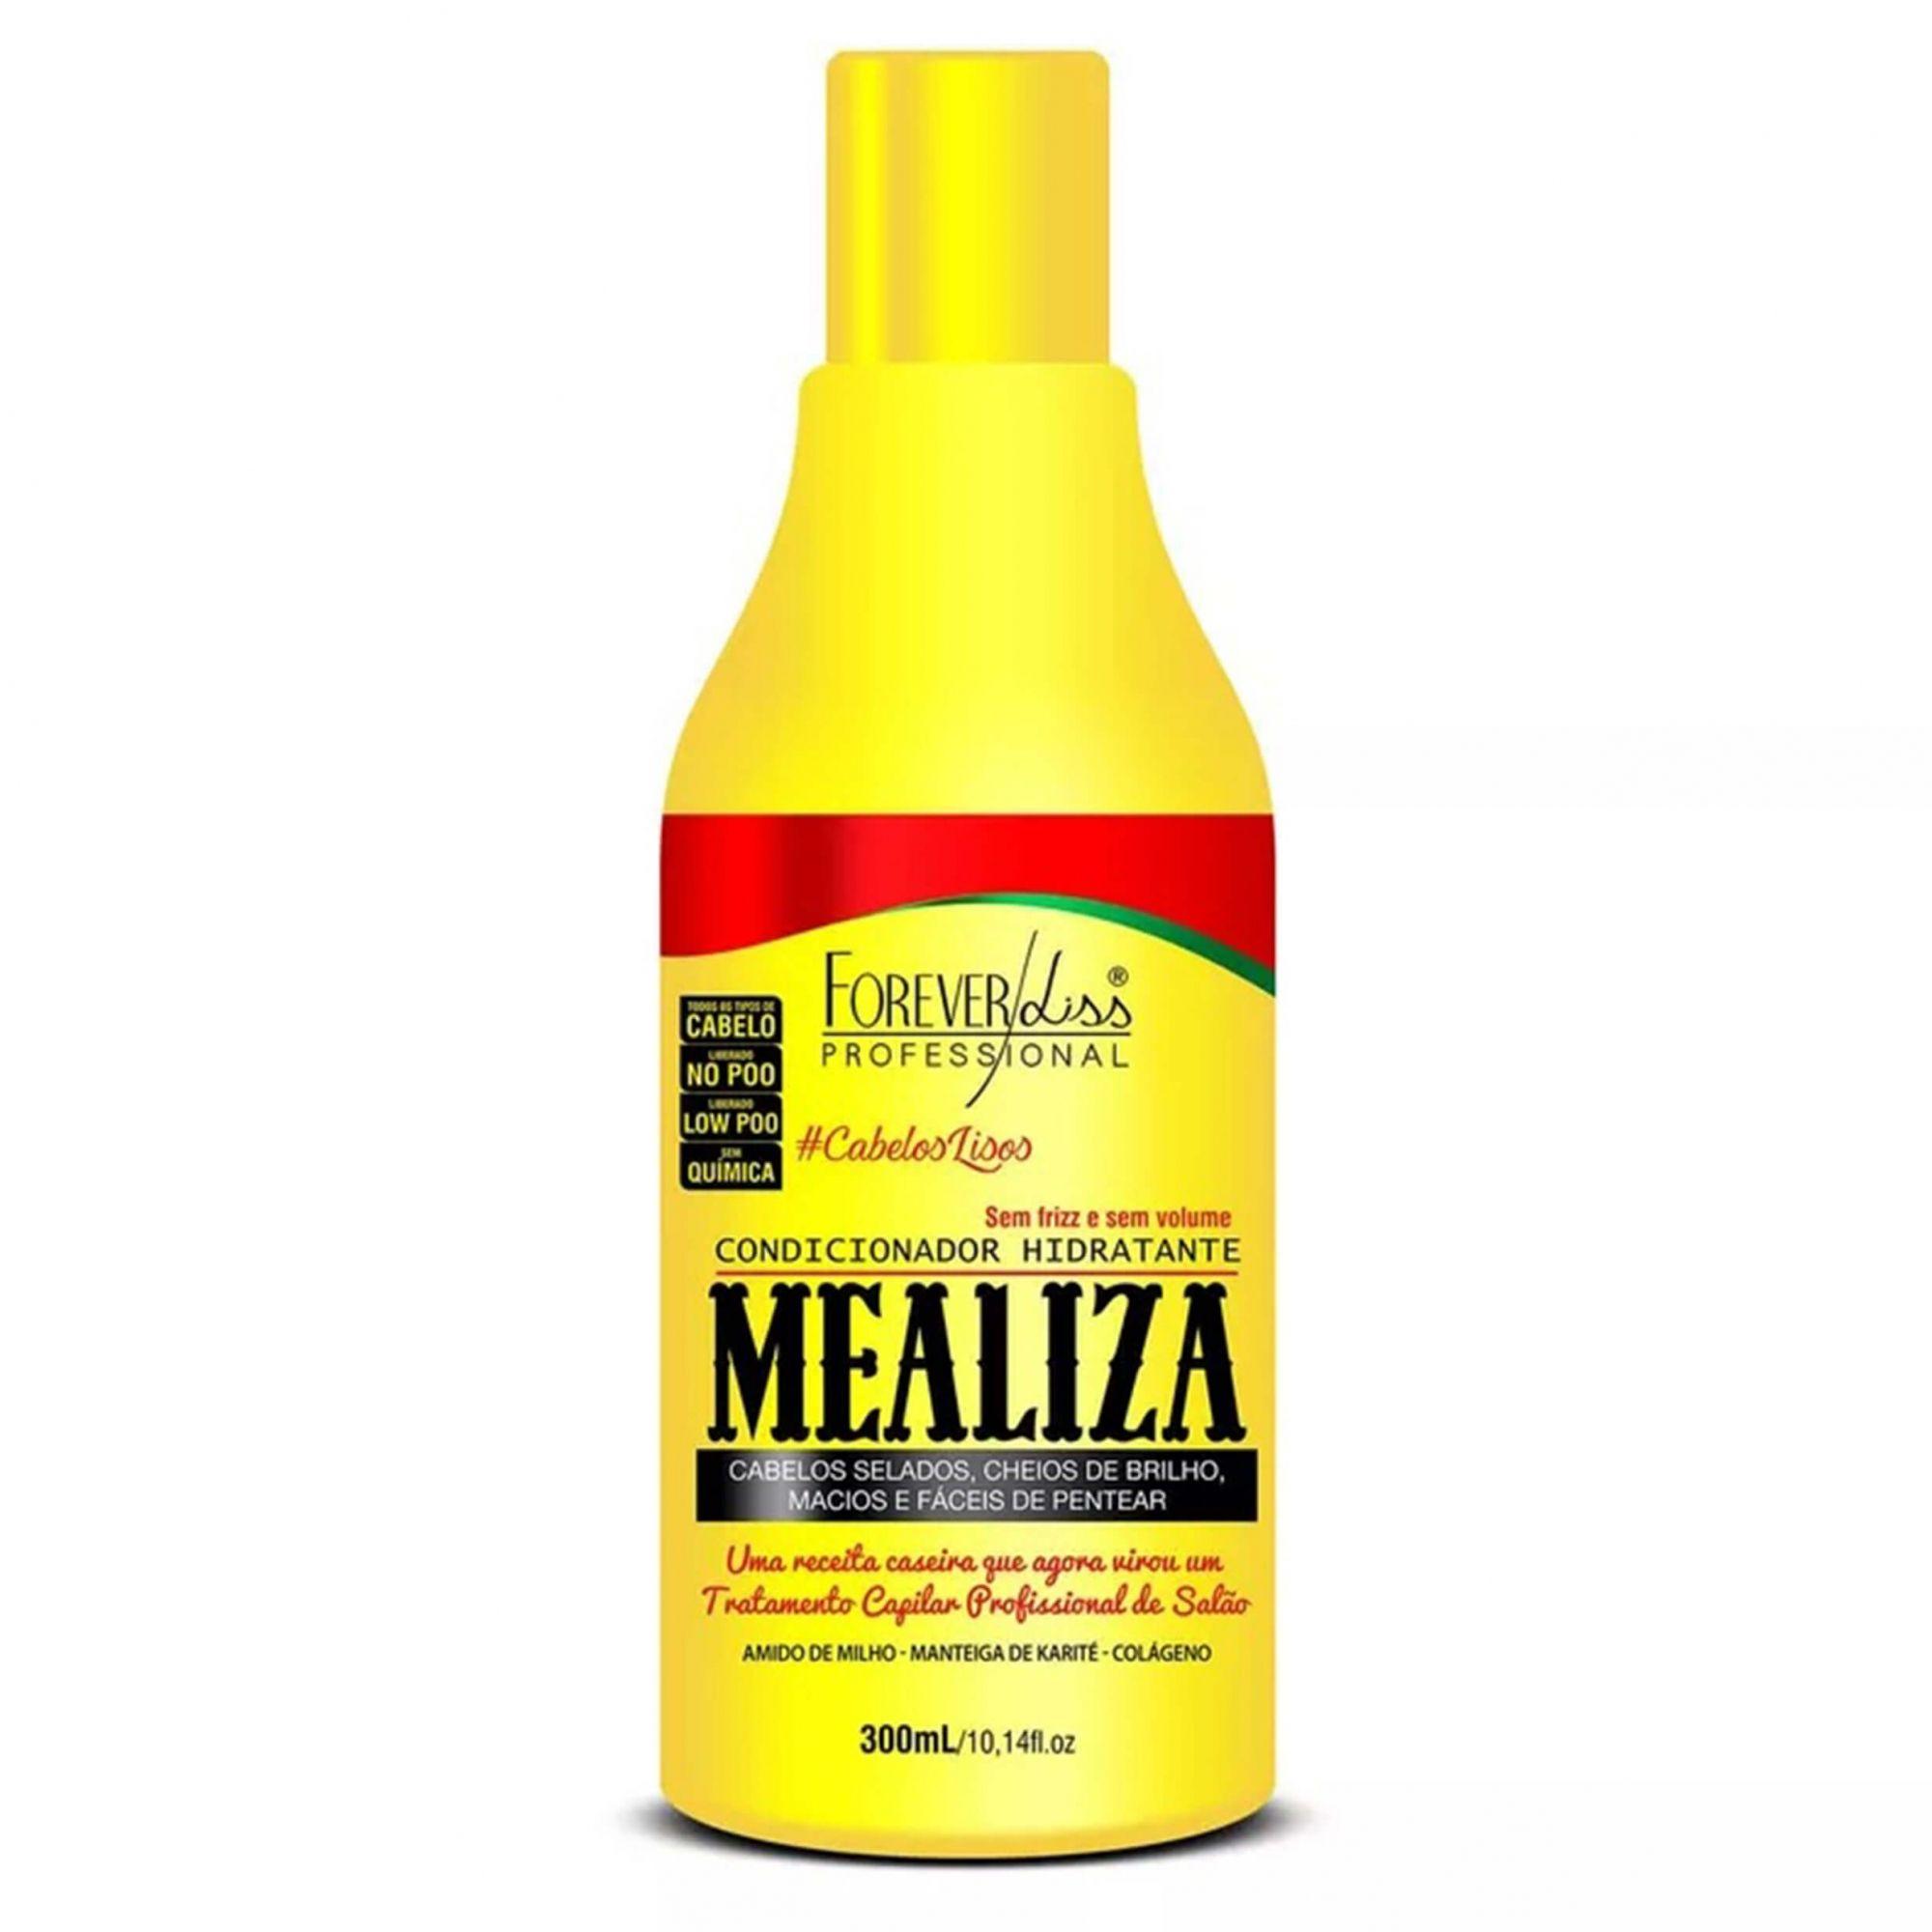 Condicionador Mealiza Forever Liss - 300ml